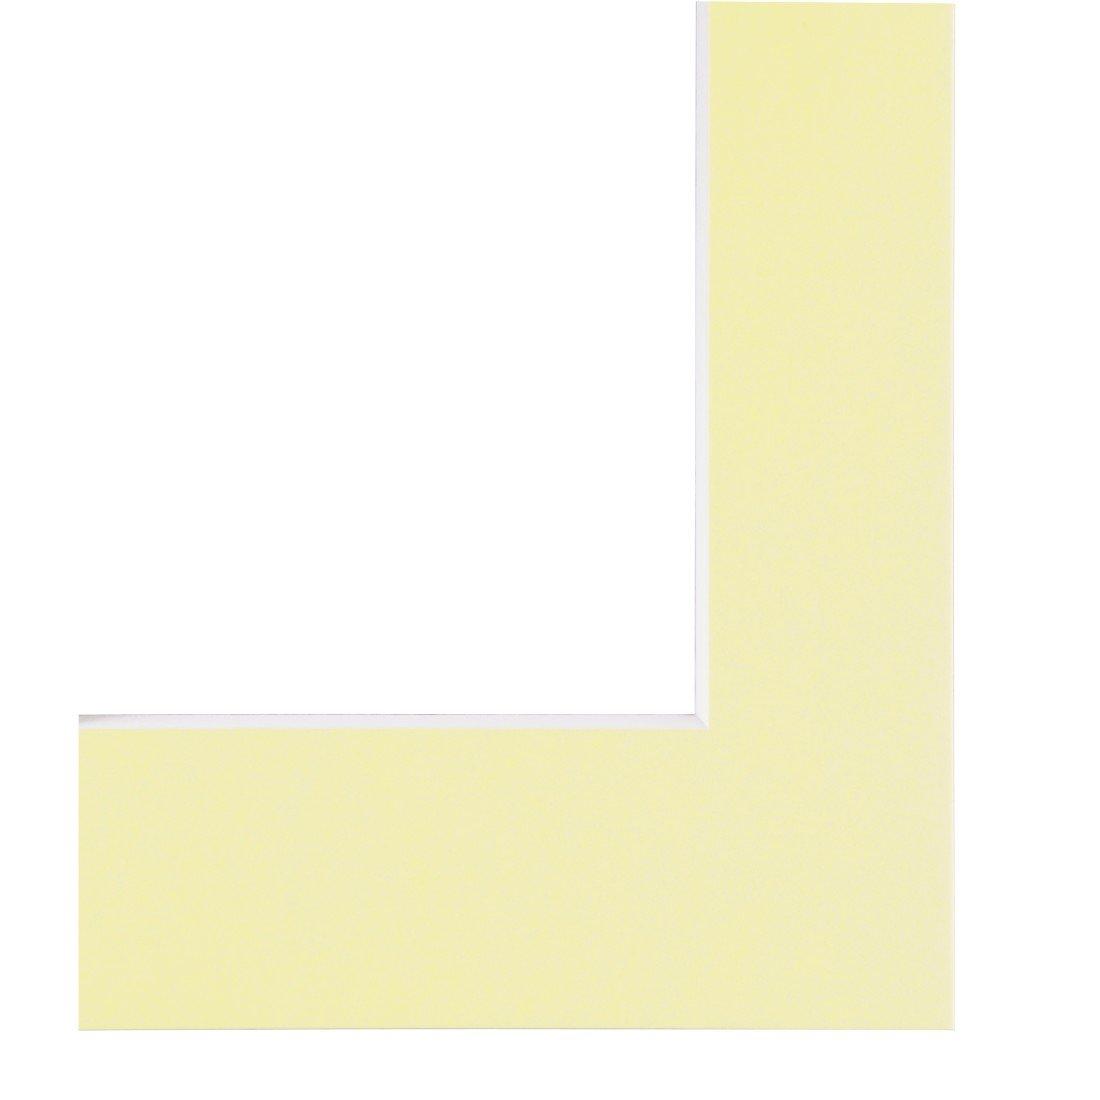 Hama Passepartout, Ivory, 24 x 30 cm - picture frames (Ivory, 24 x 30 cm, Ivory) 00059891